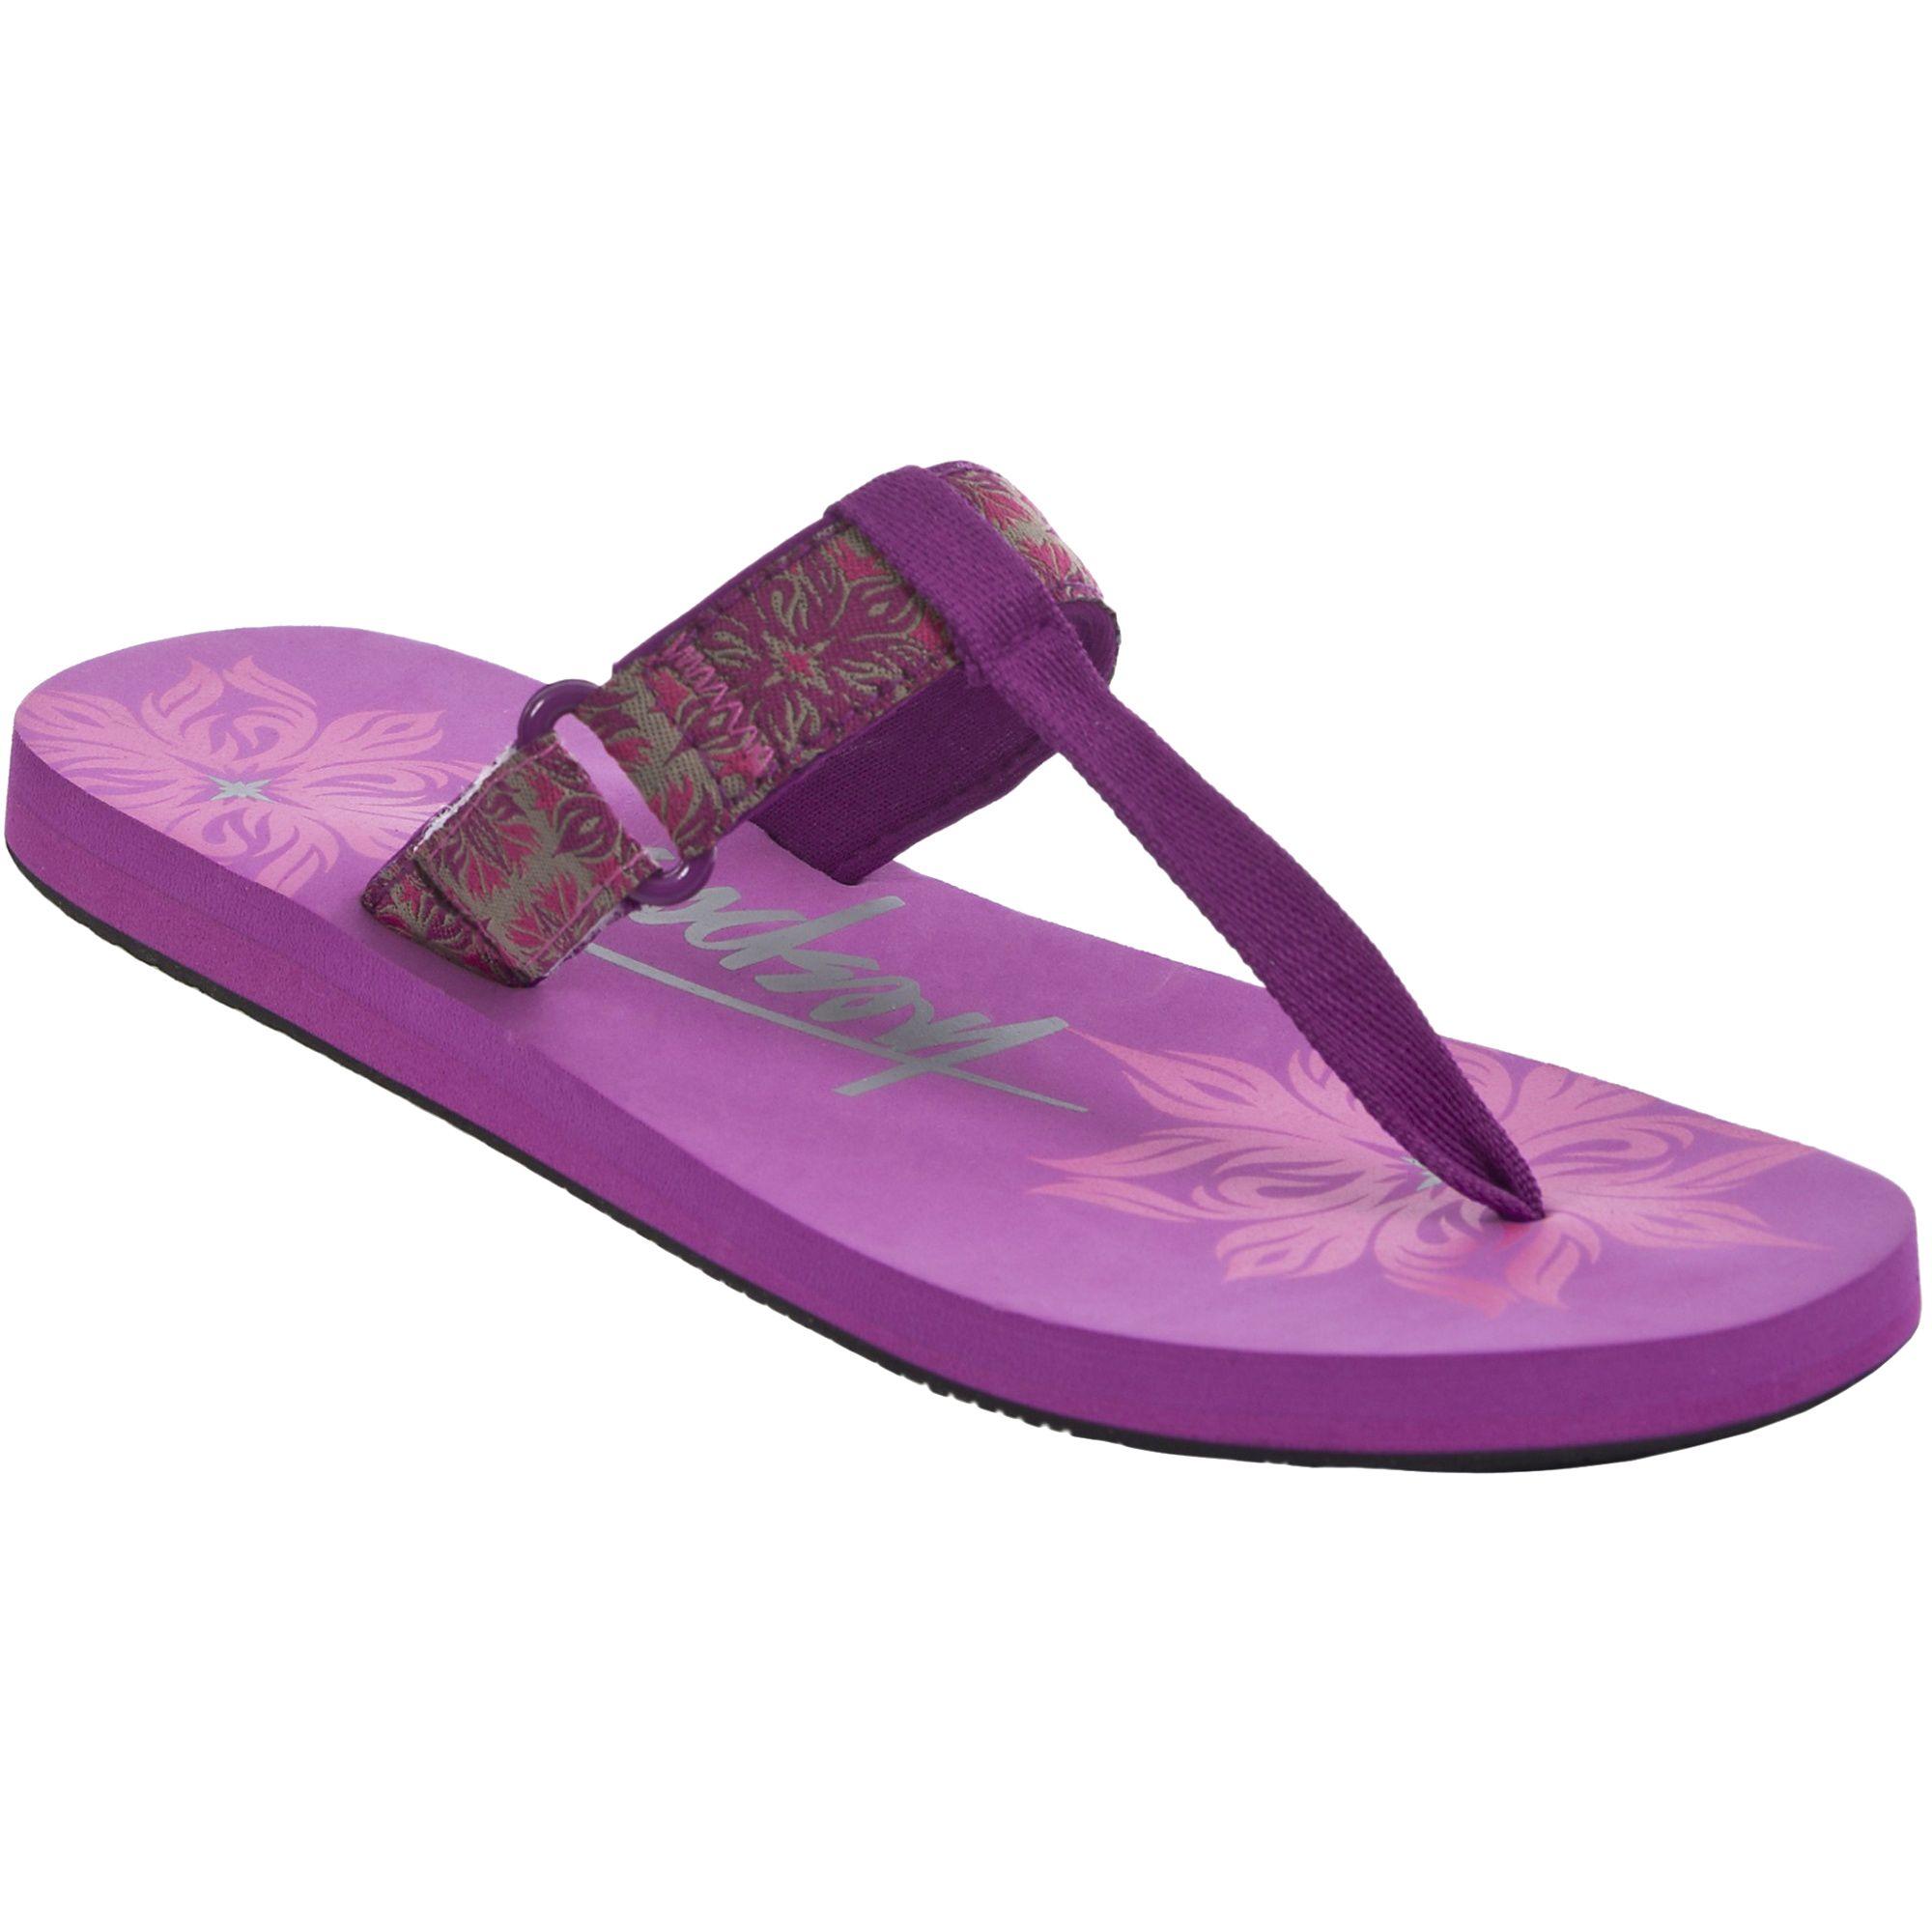 Trespass Womens/Ladies Panora Summer Flip Flops